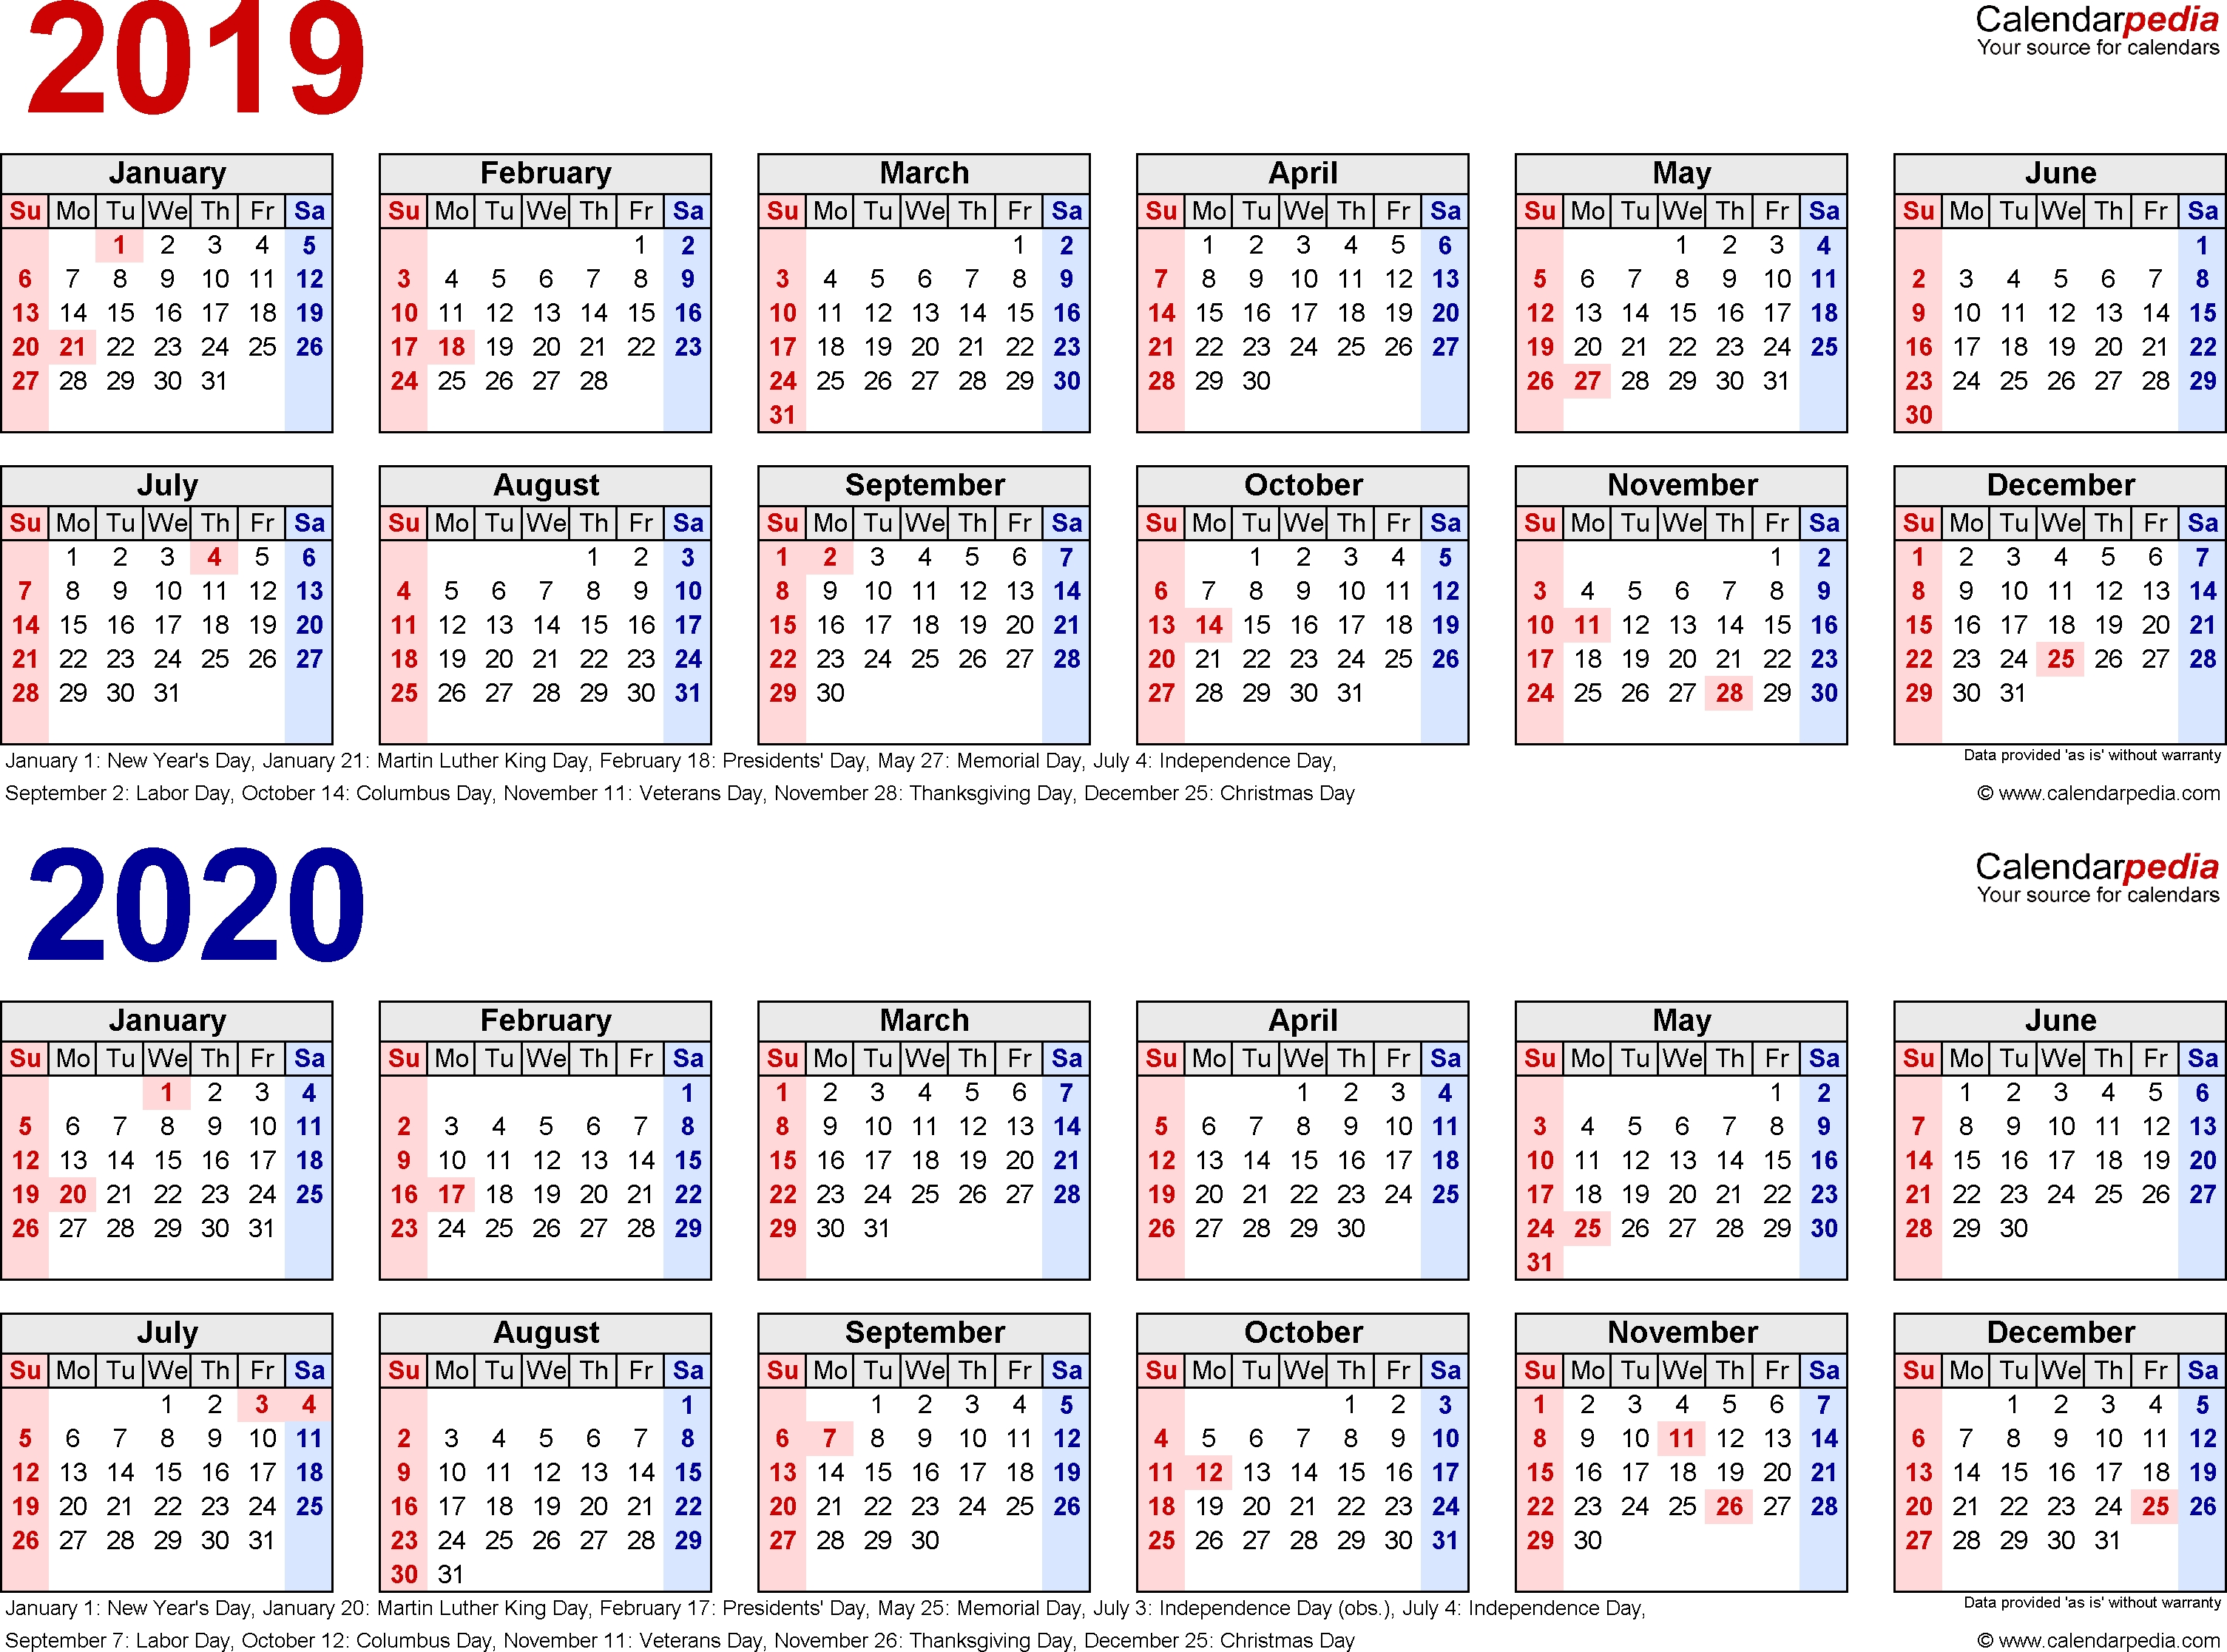 2019-2020 Calendar - Free Printable Two-Year Pdf Calendars pertaining to Free Printable Calendars 2019-2020 With Holidays